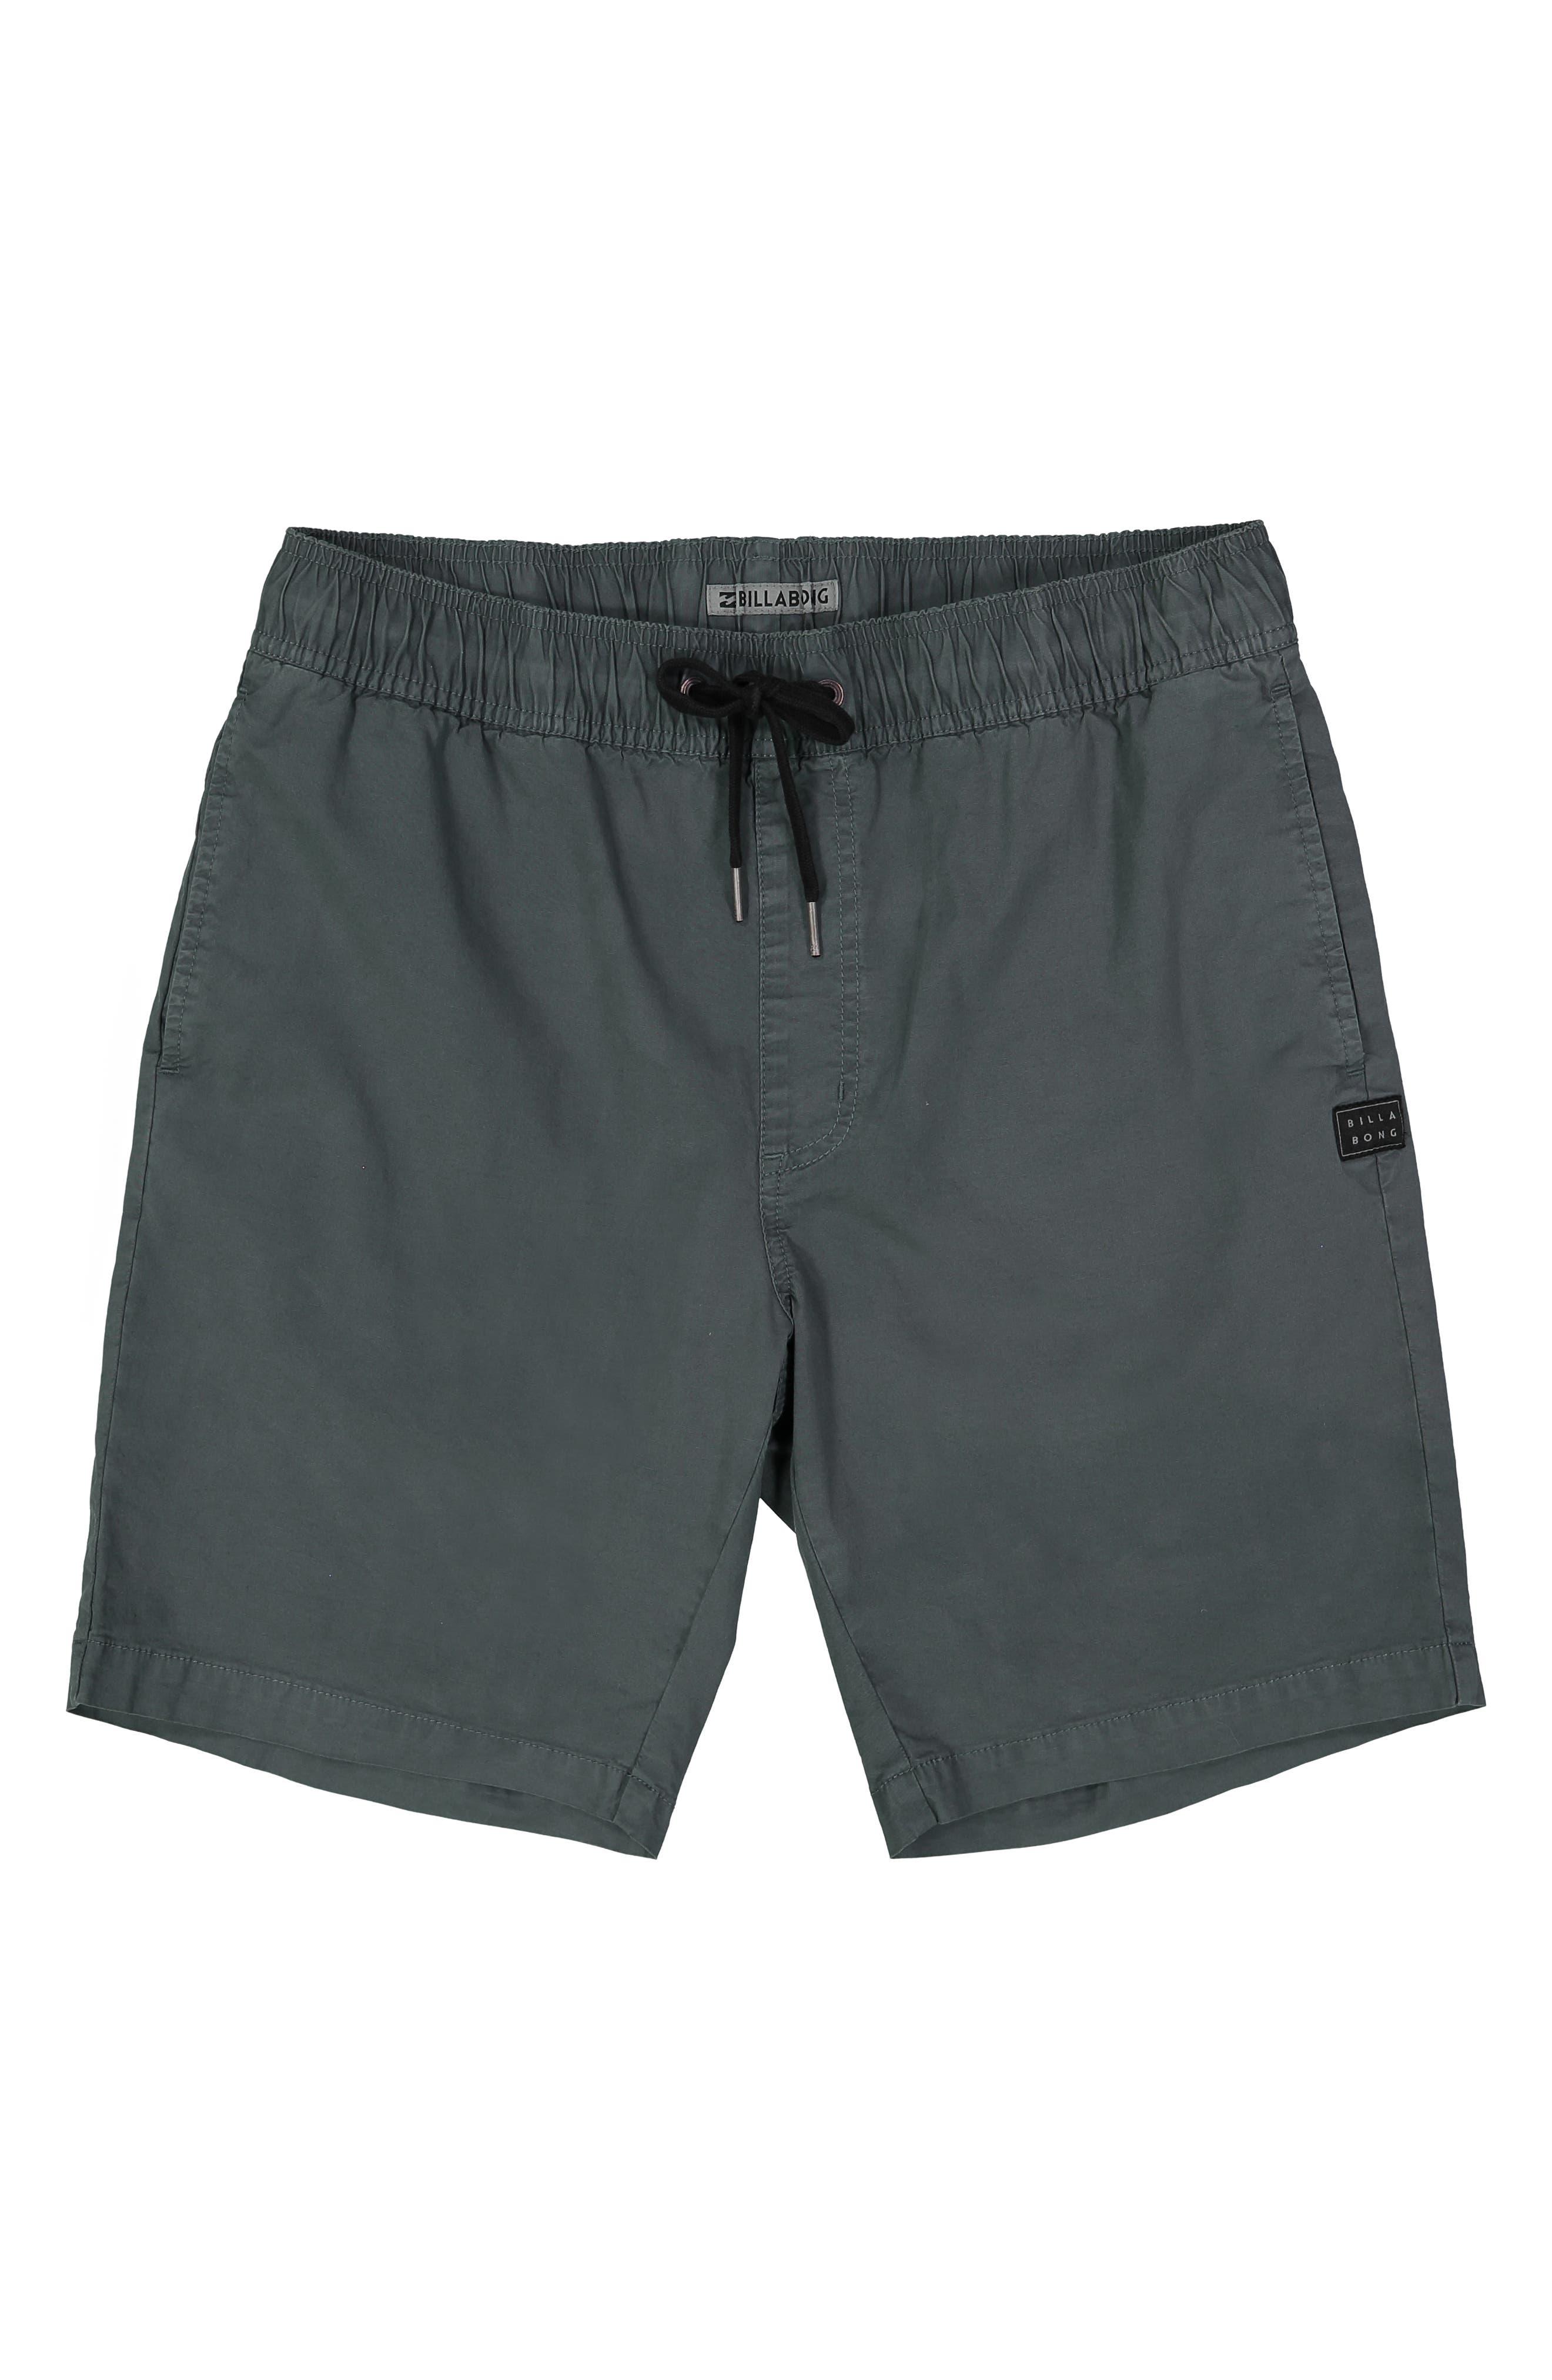 BILLABONG,                             Larry Layback Stretch Cotton Shorts,                             Main thumbnail 1, color,                             WASHED SLATE